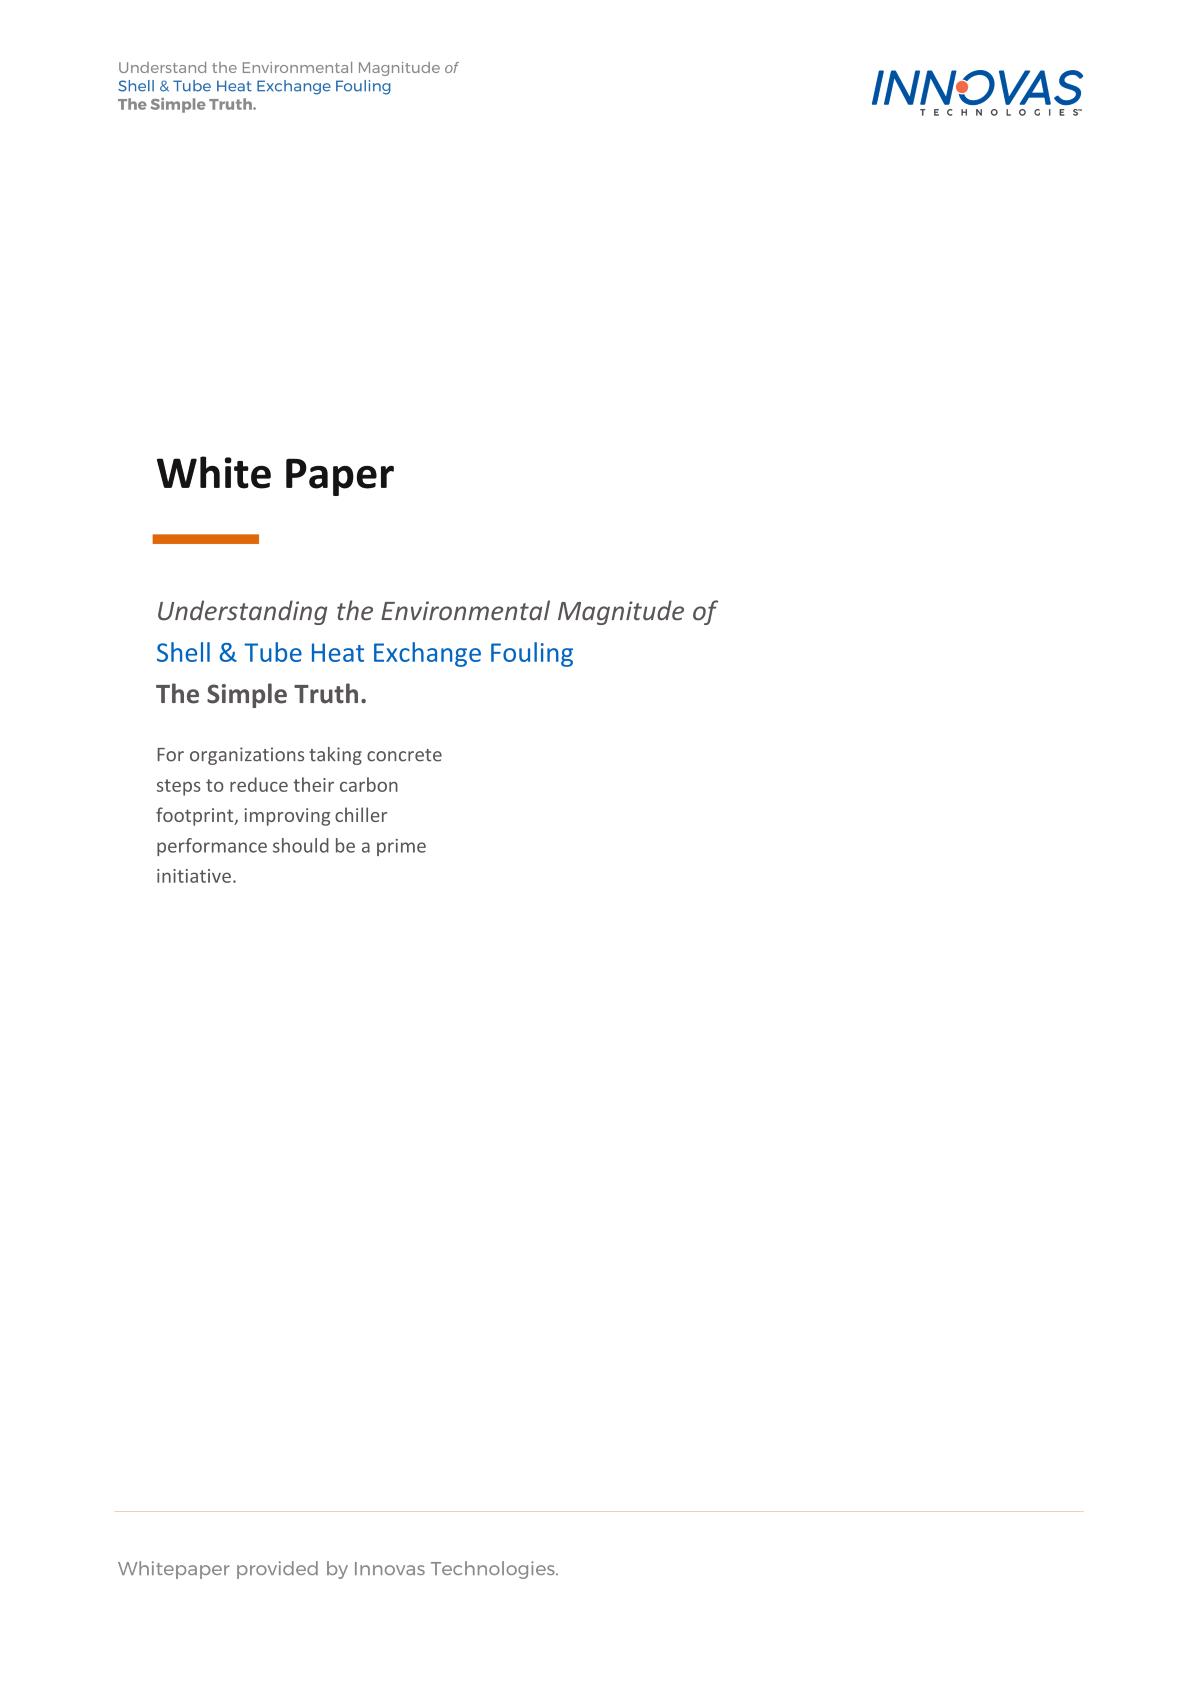 Sustainability Whitepaper